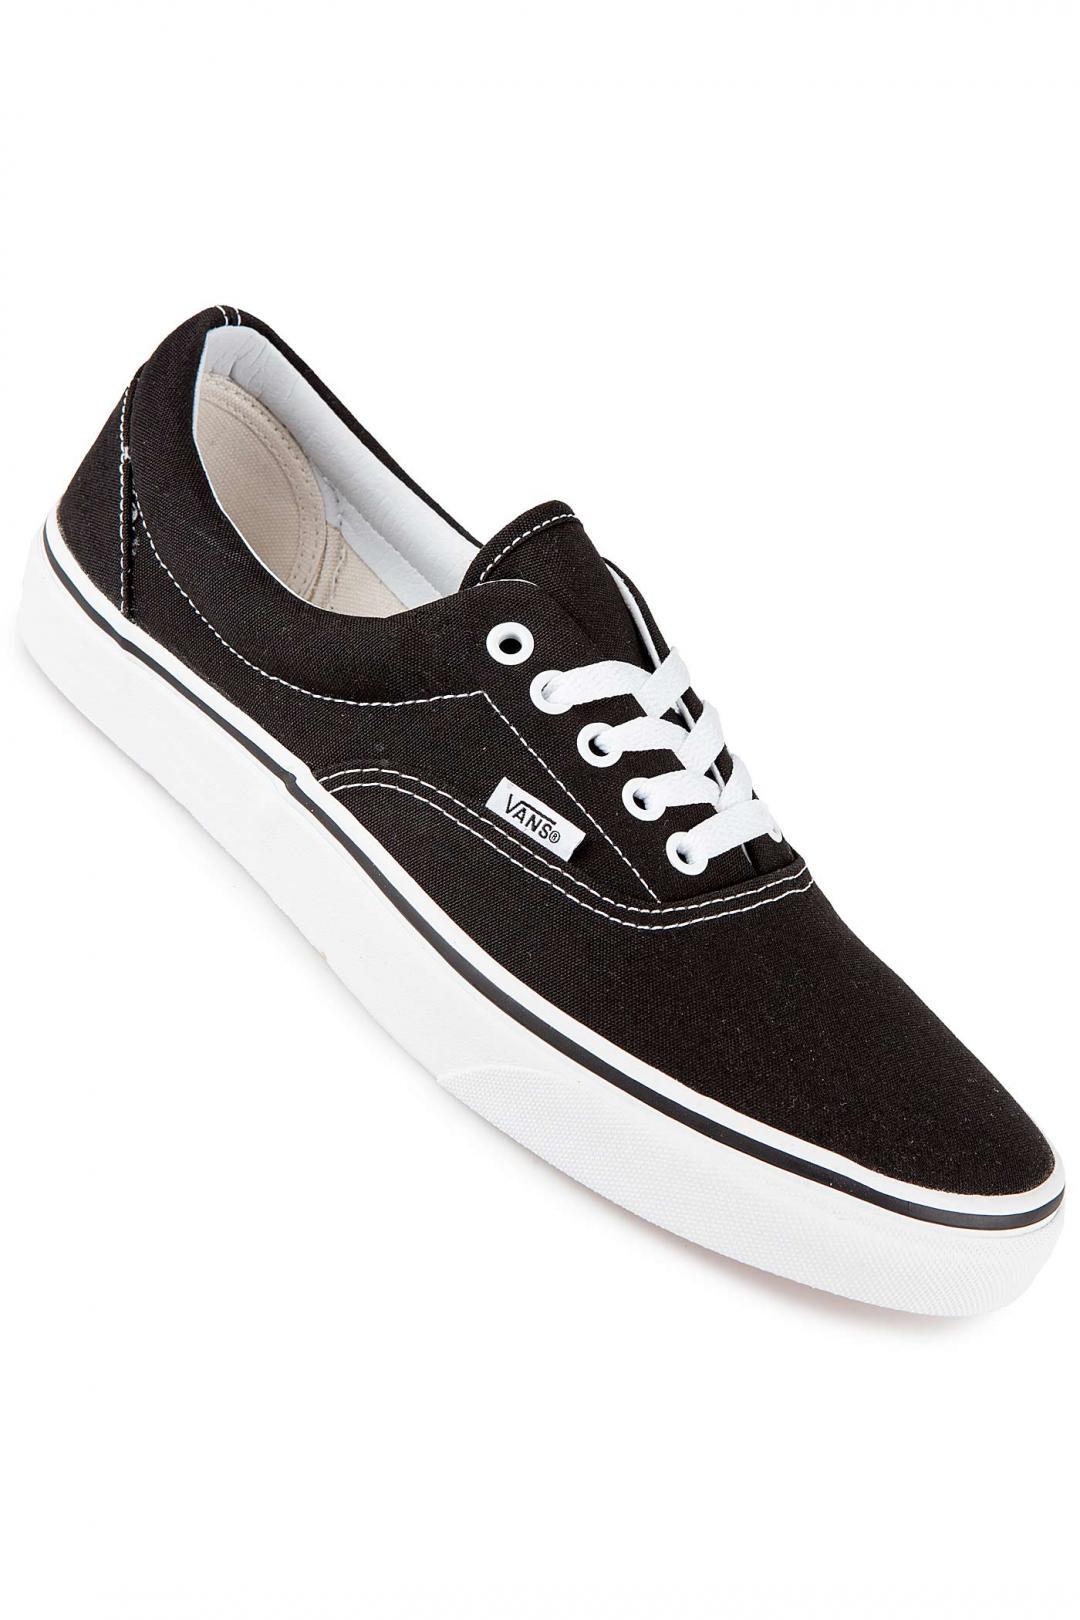 Uomo/Donna Vans Era black | Sneaker